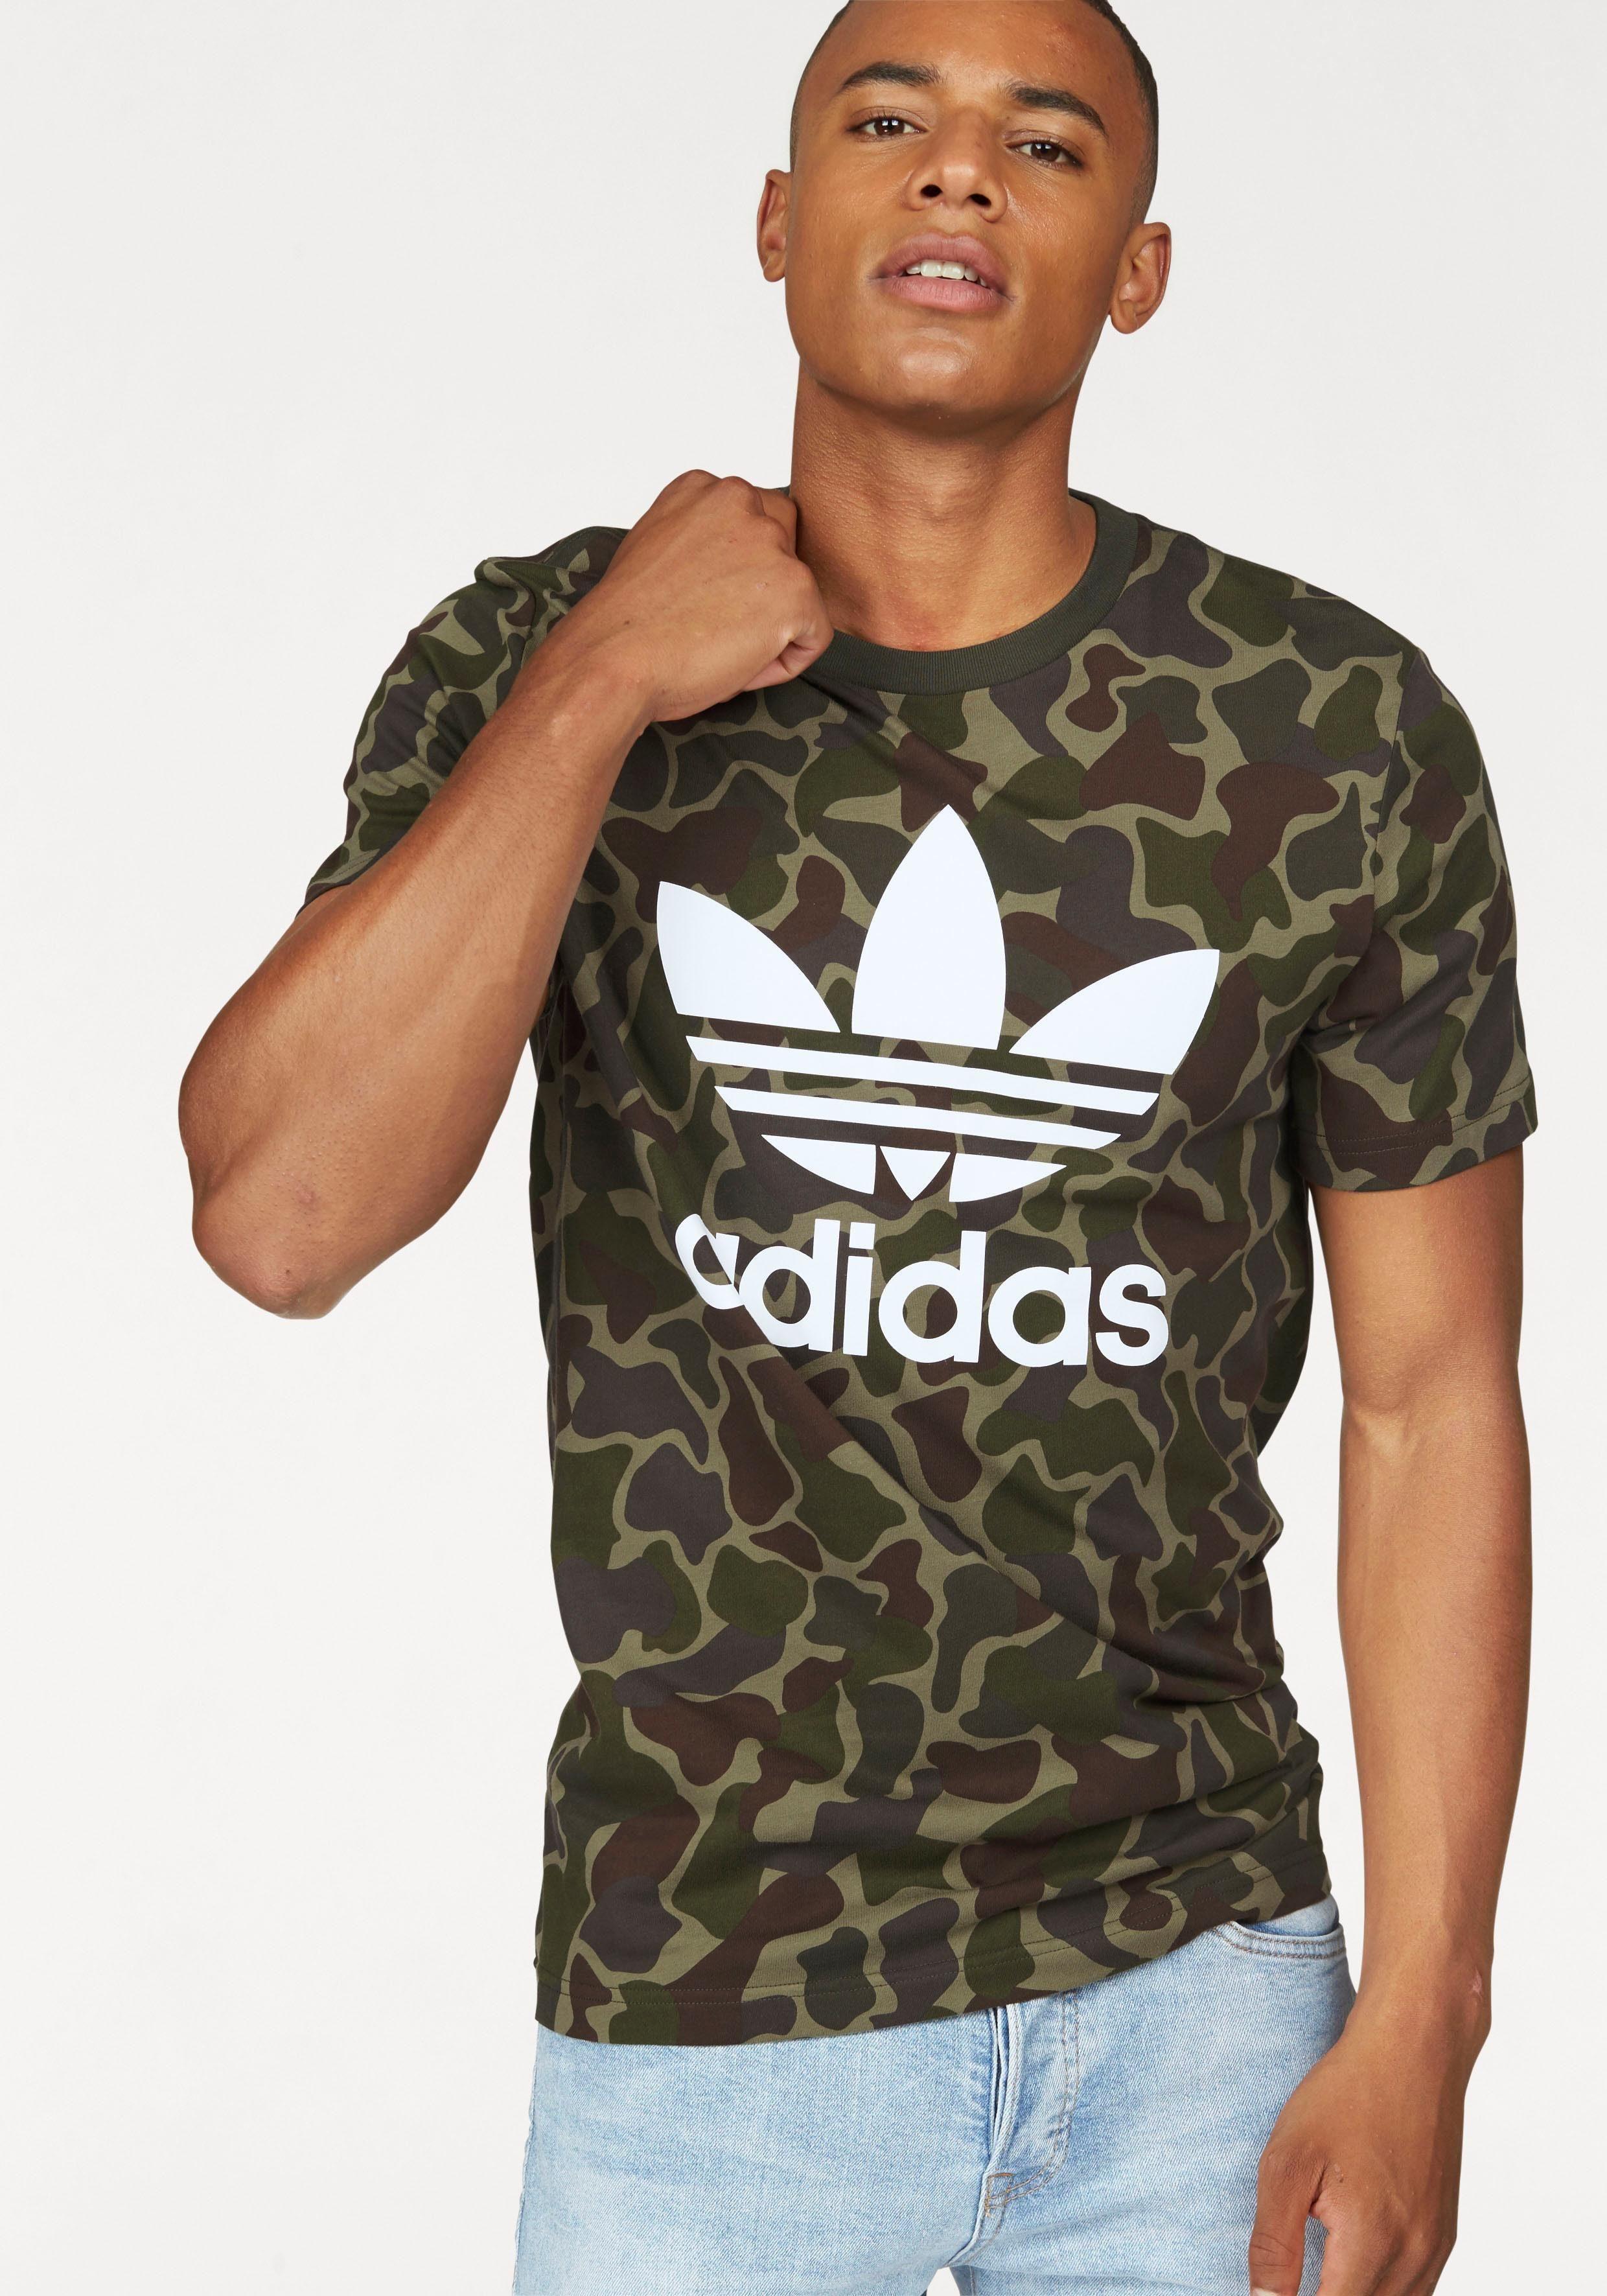 adidas t-shirt camouflage